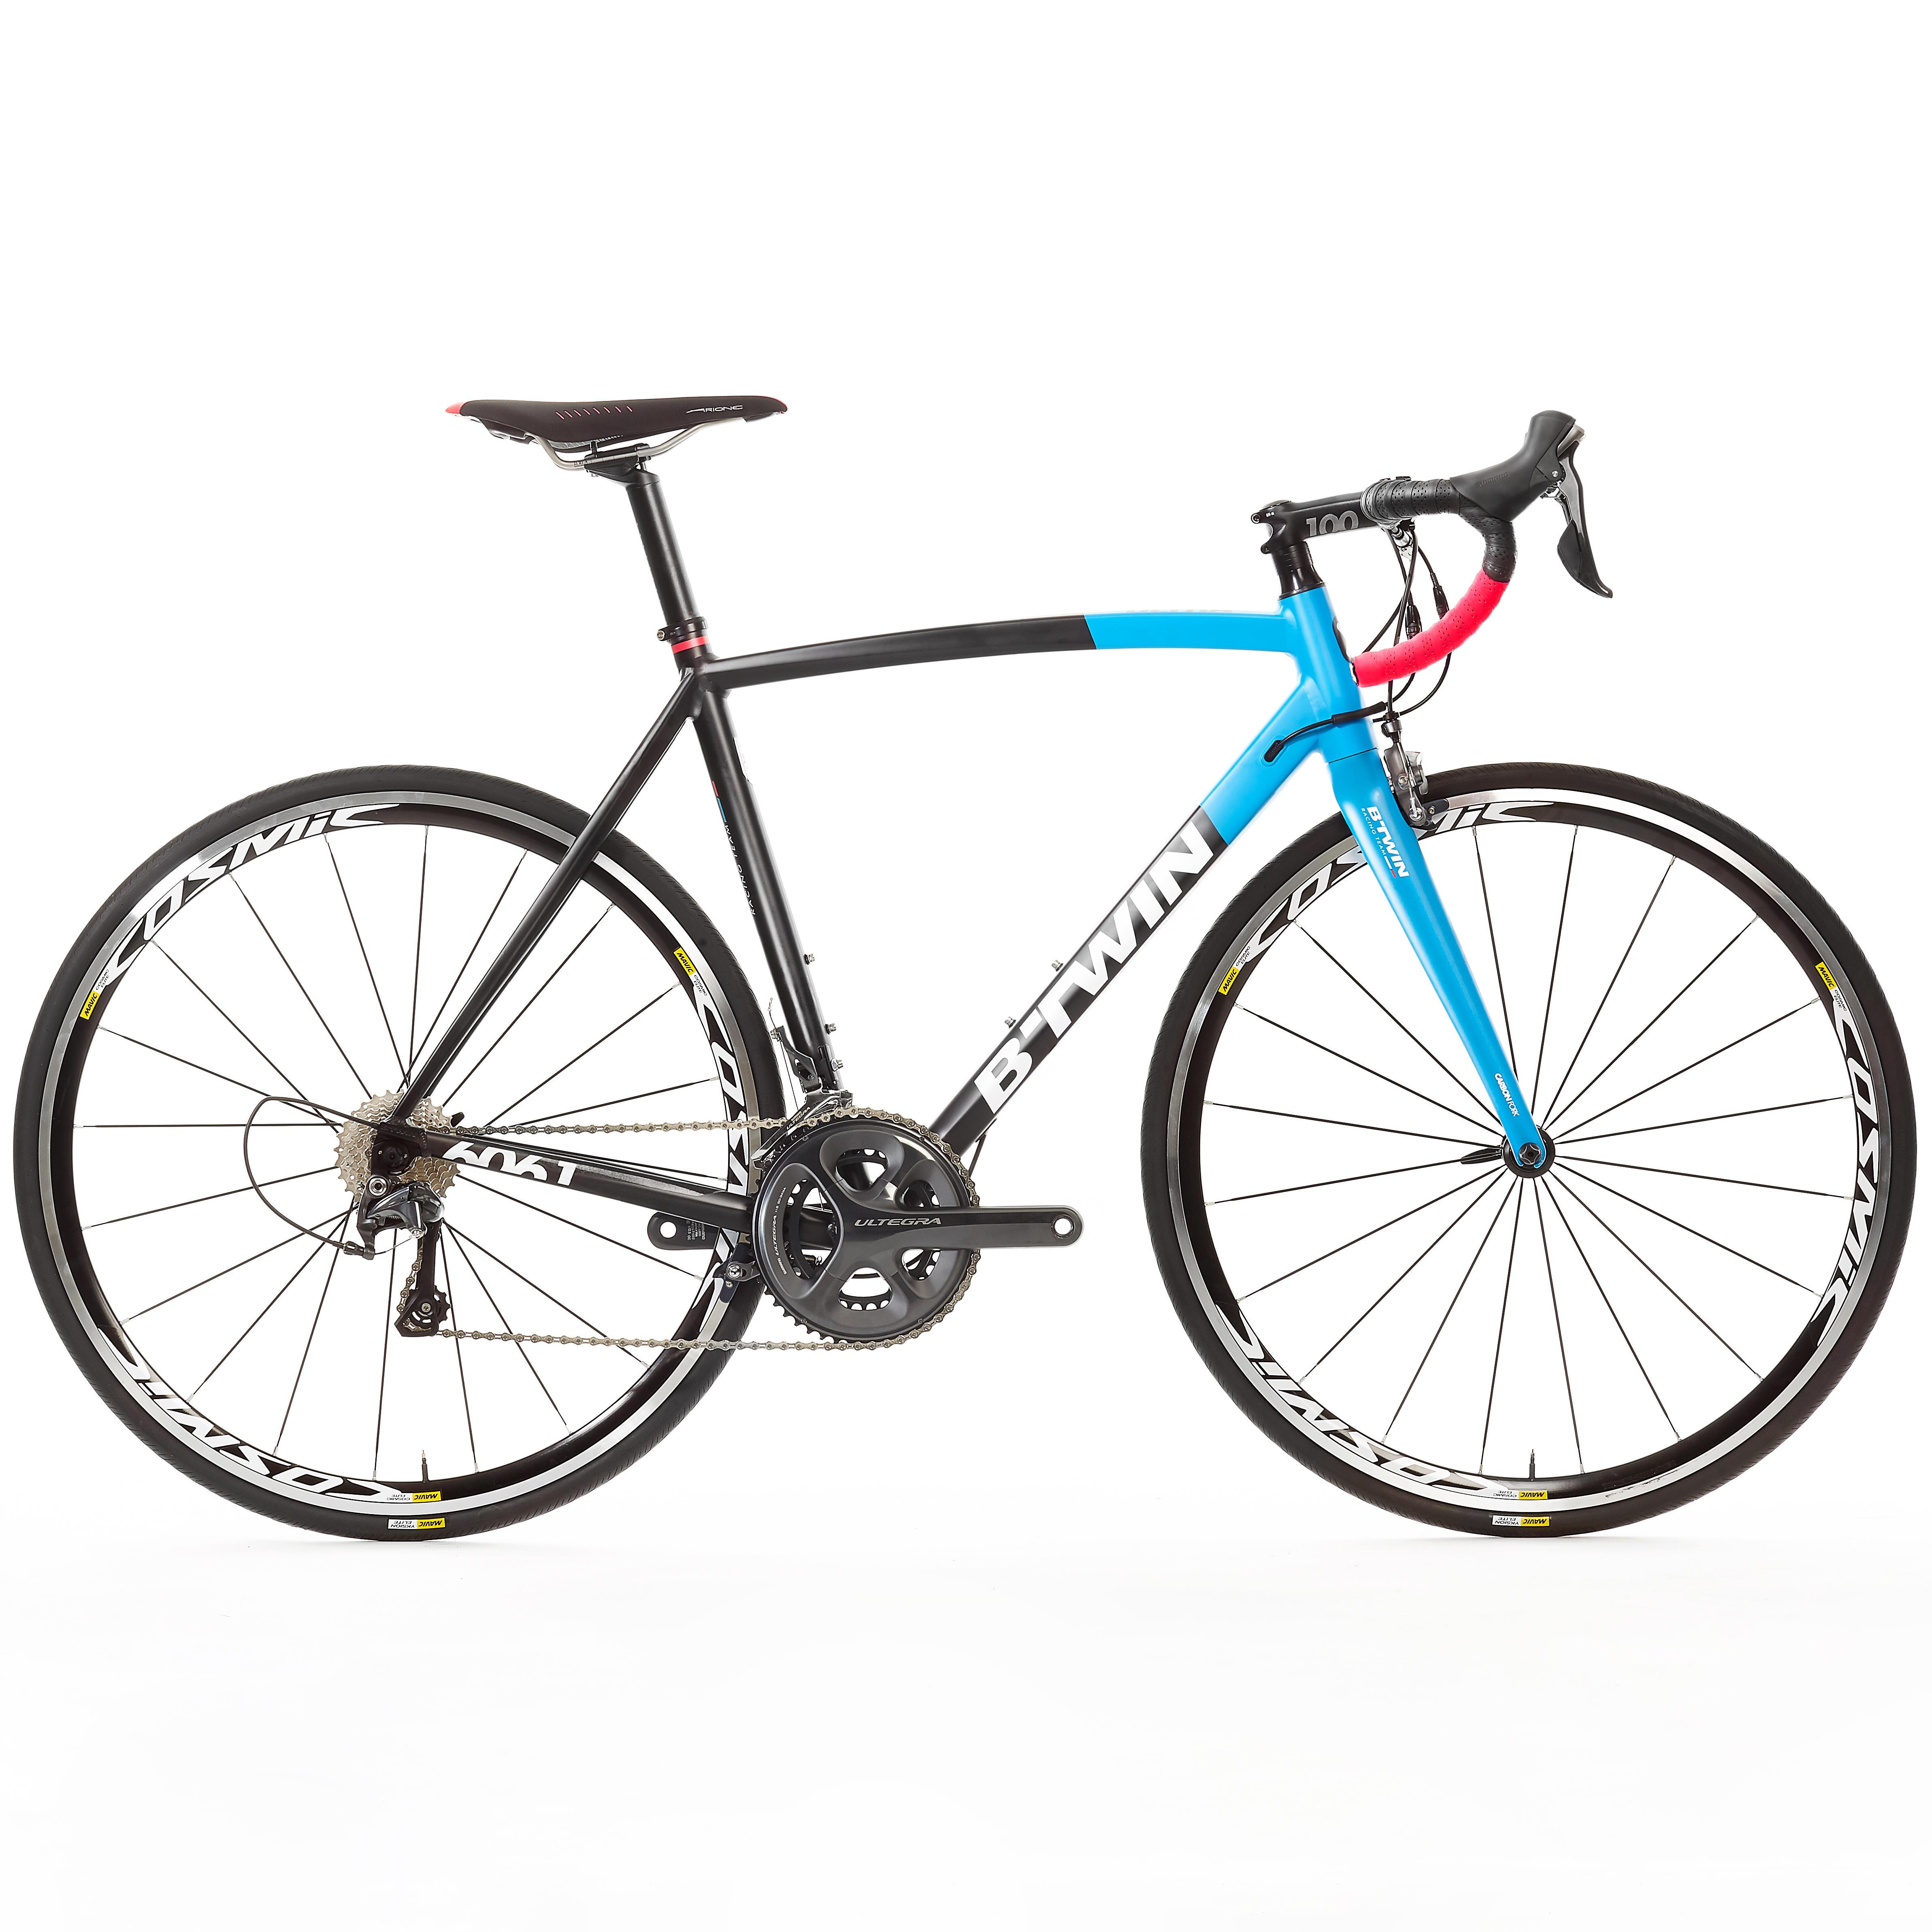 B'twin Racefiets Ultra 920 AF (aluminium frame) - S